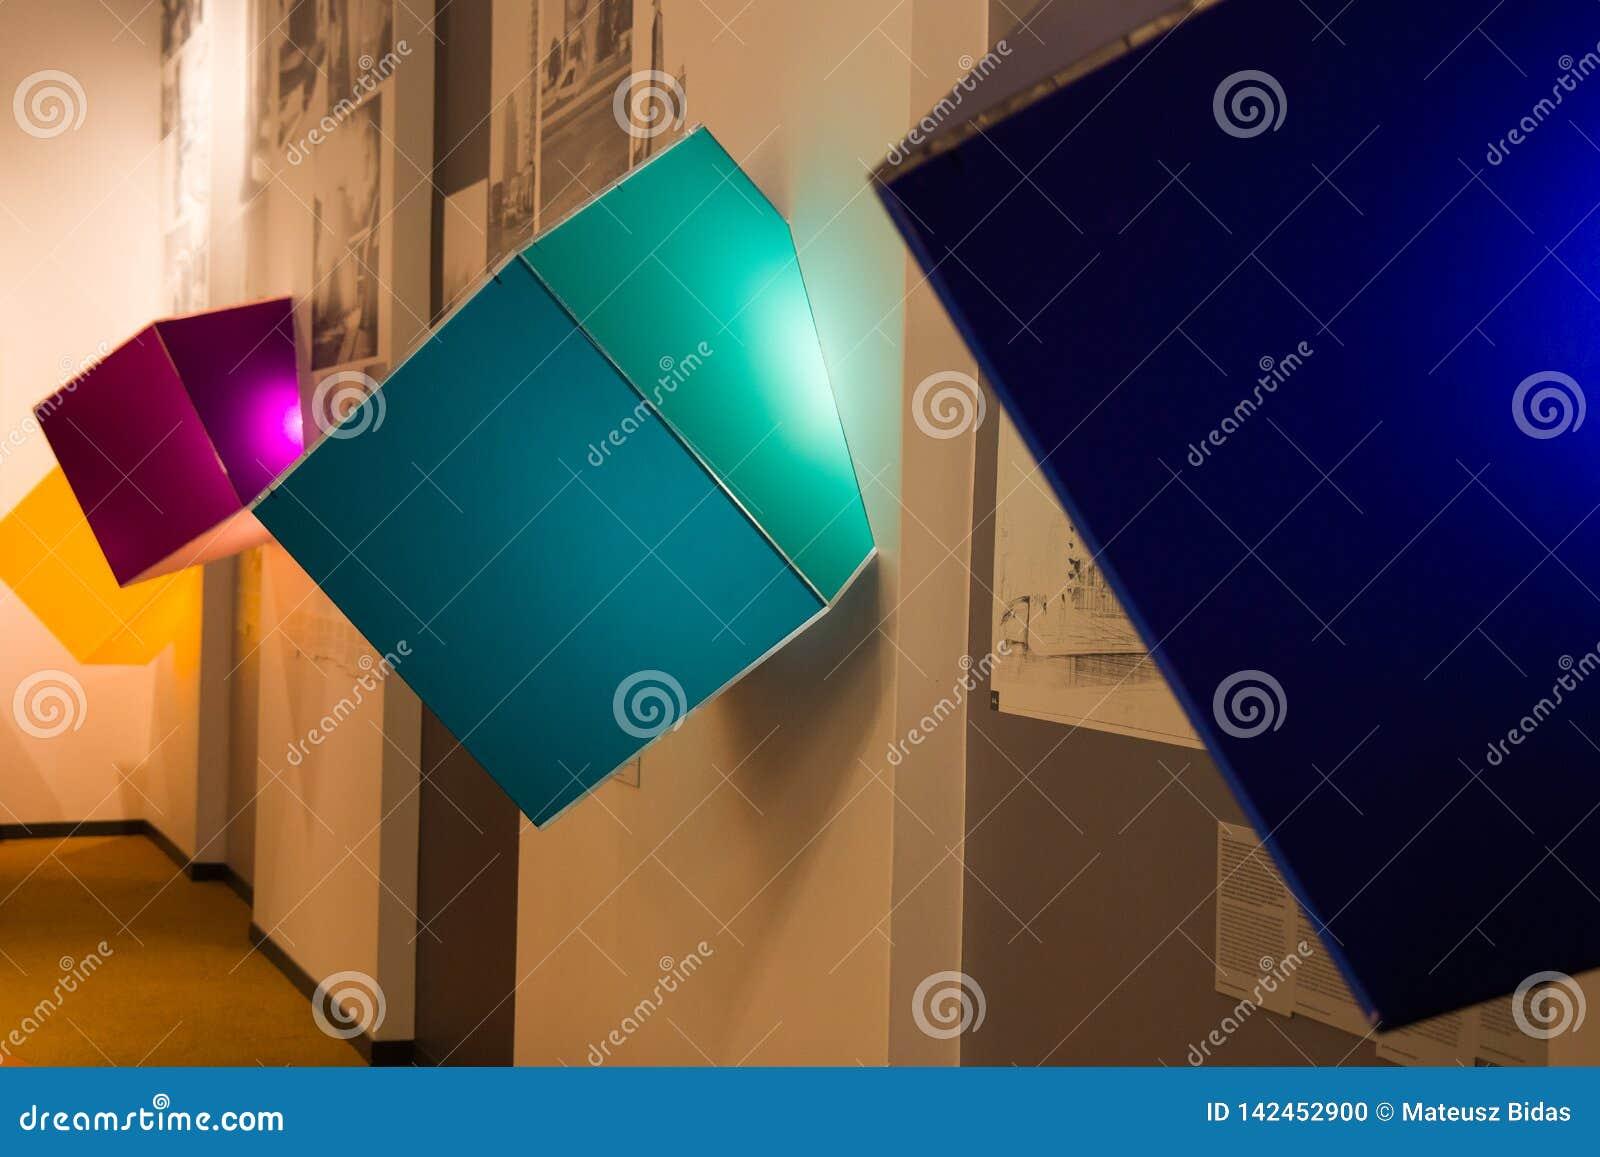 A couple corolful luminous 3D cubes indoor